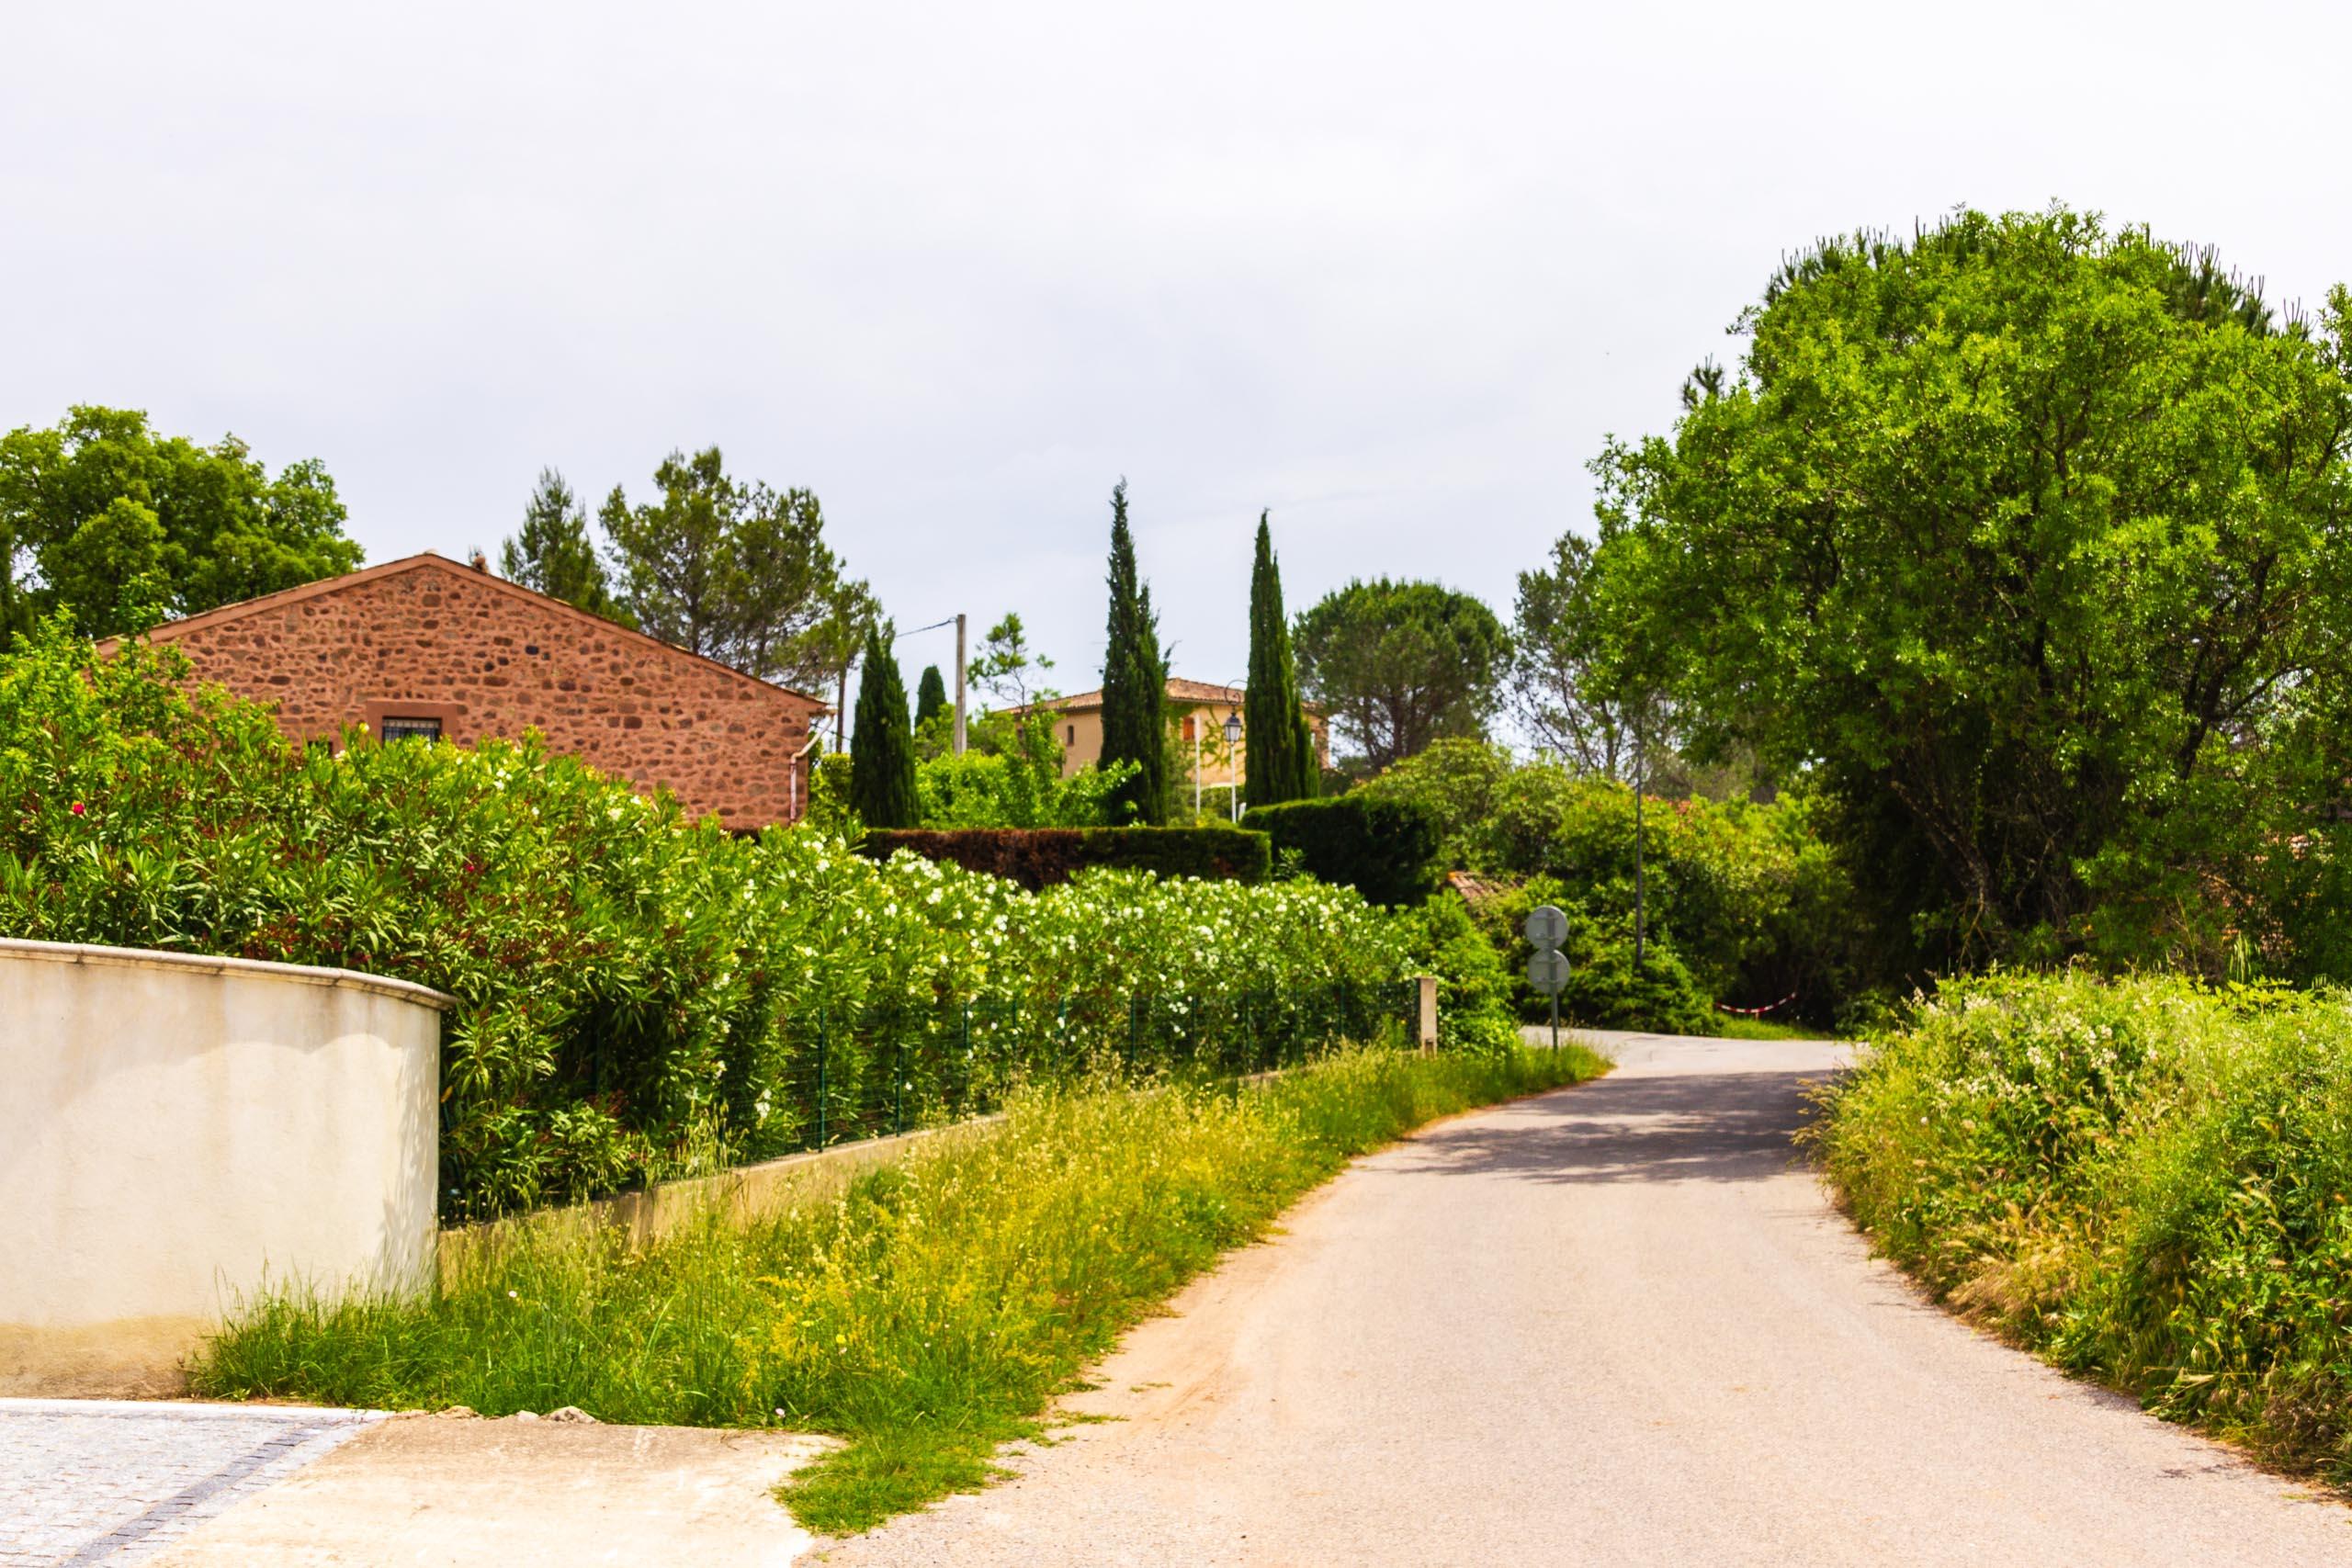 2018 05 Provence LeMitan 001